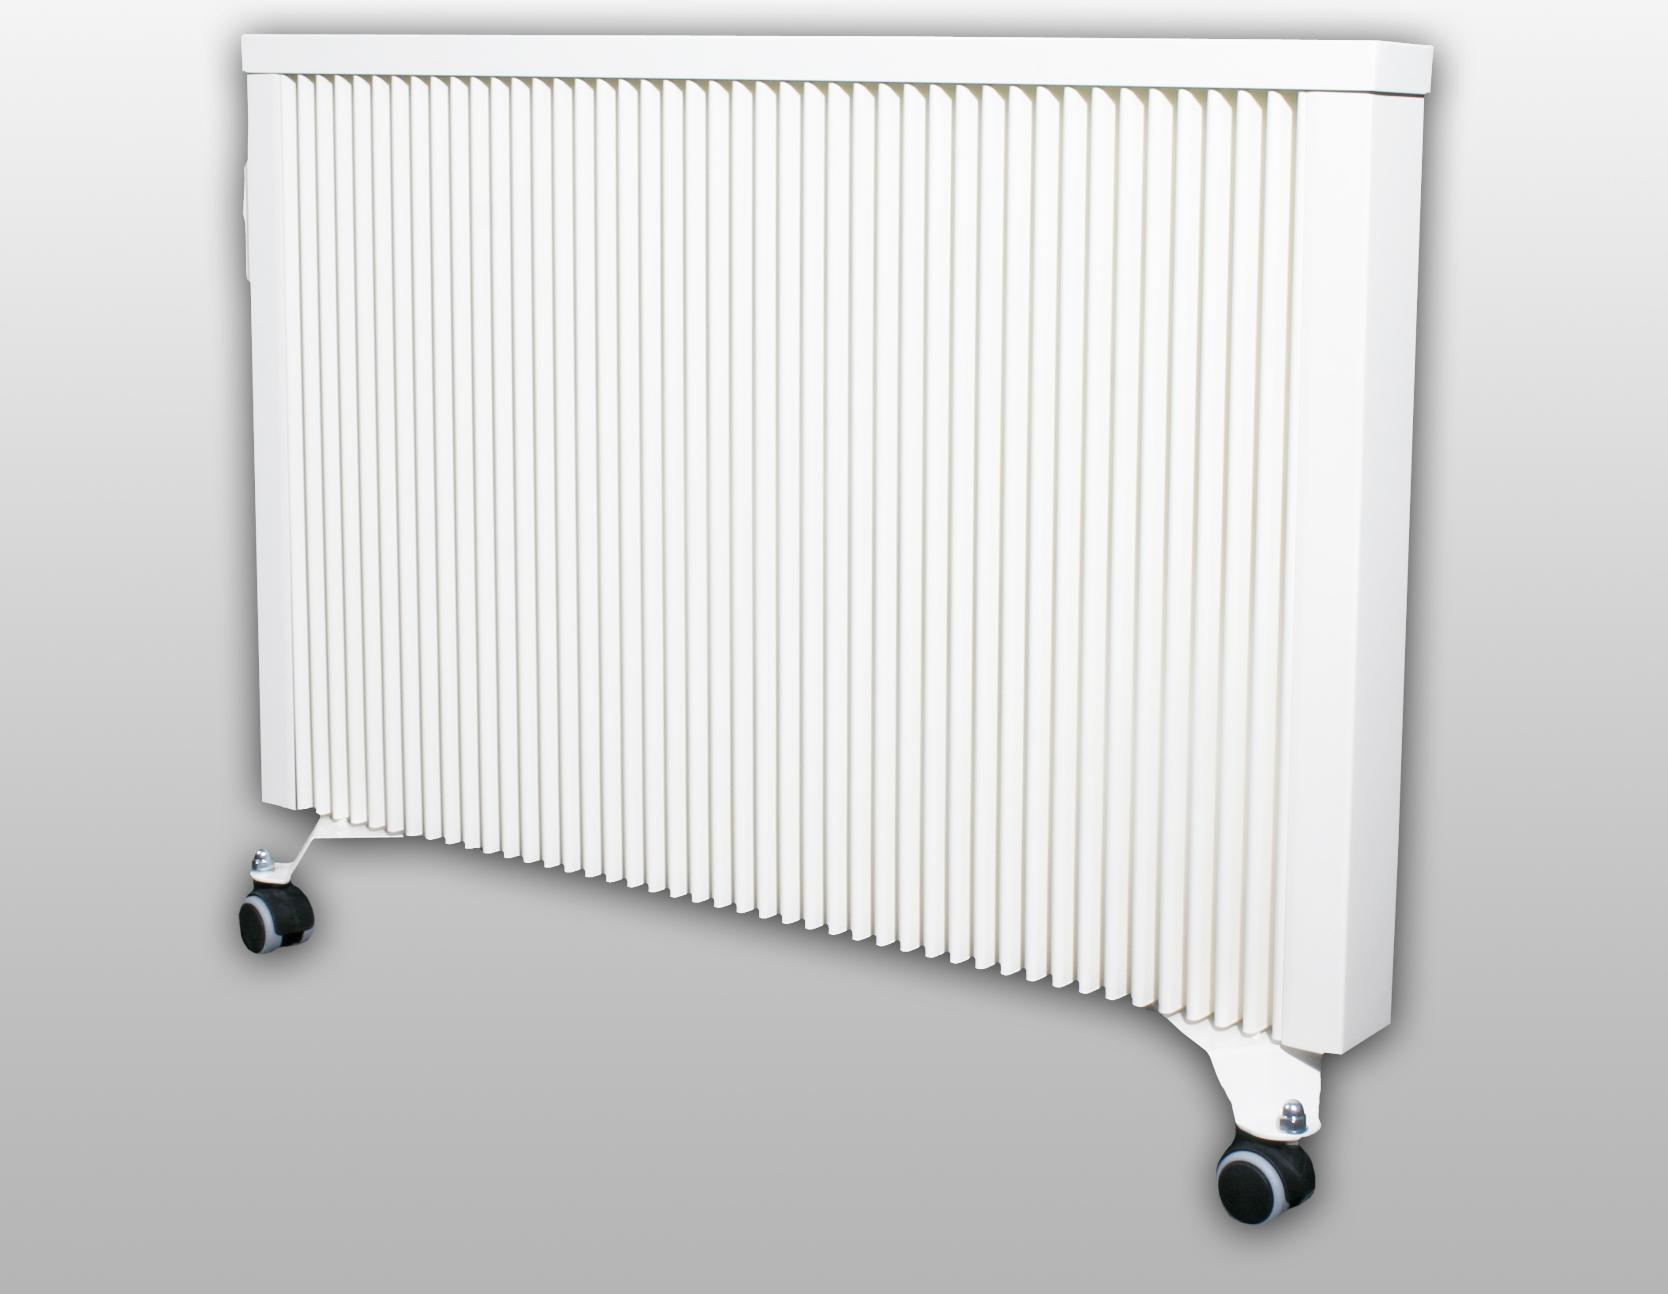 Dvojitý topný panel HD, TYP HD 150, 1500 W